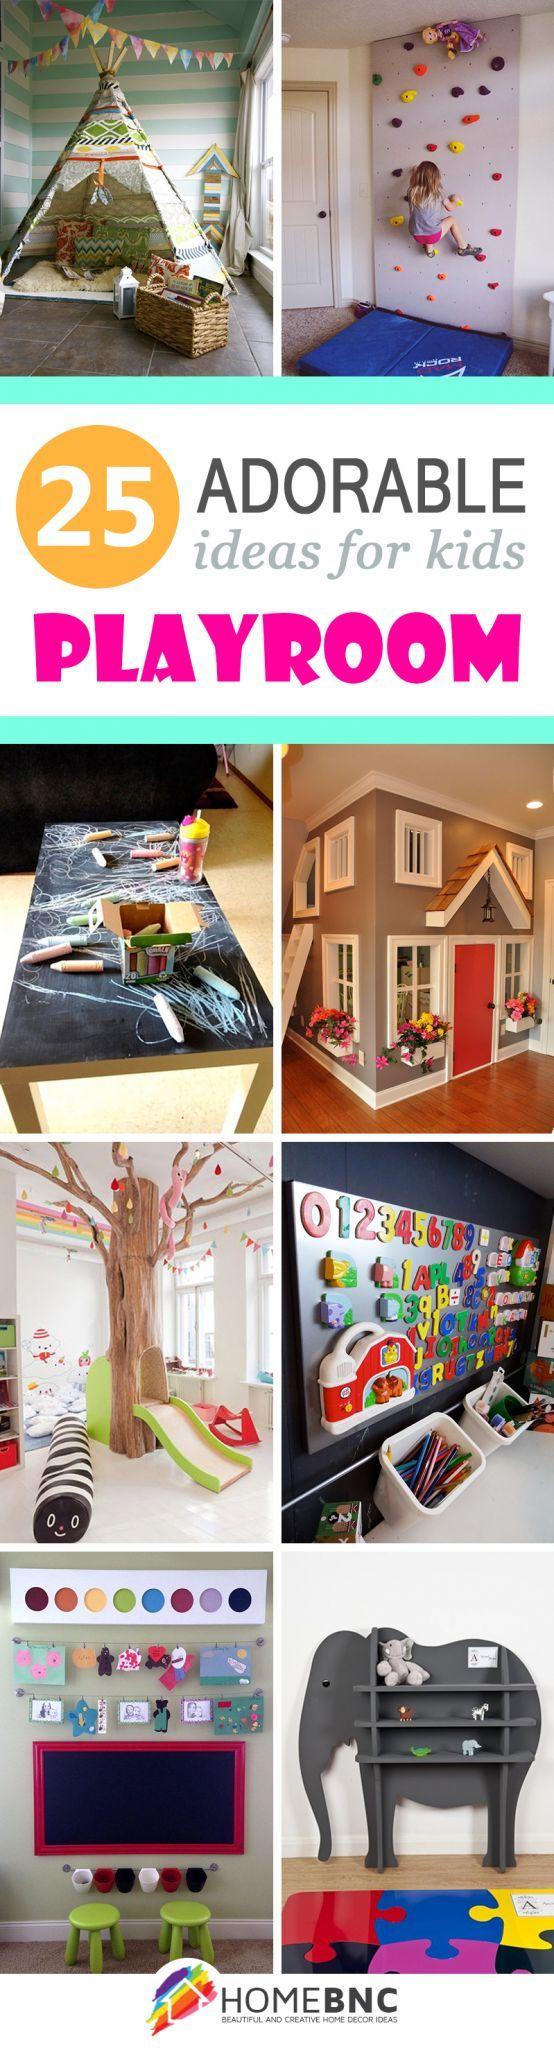 Kids Playroom Decorations